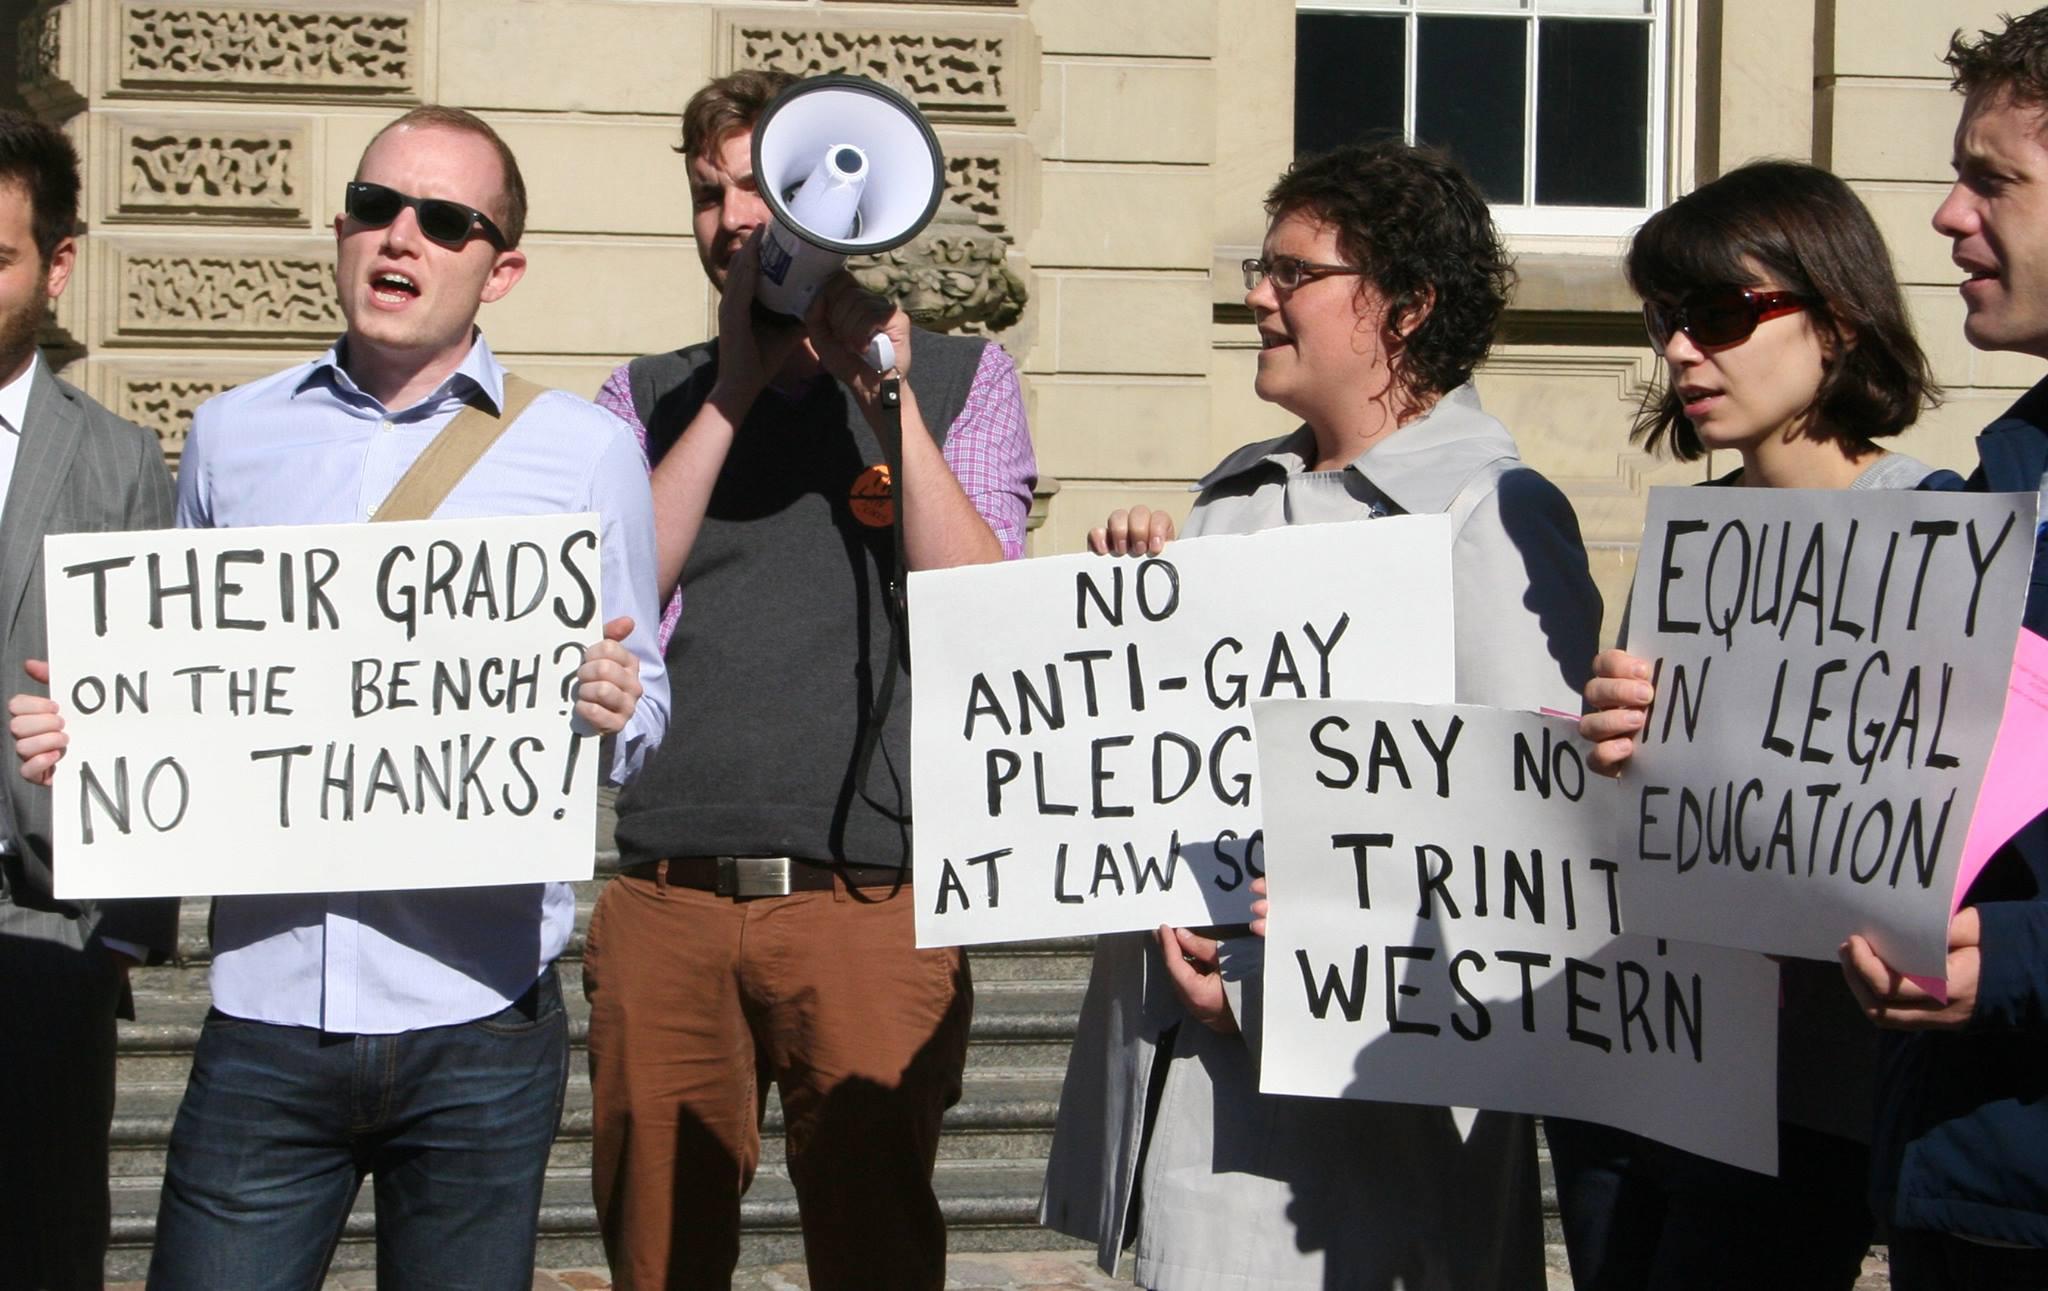 trinity_western_protest.jpg